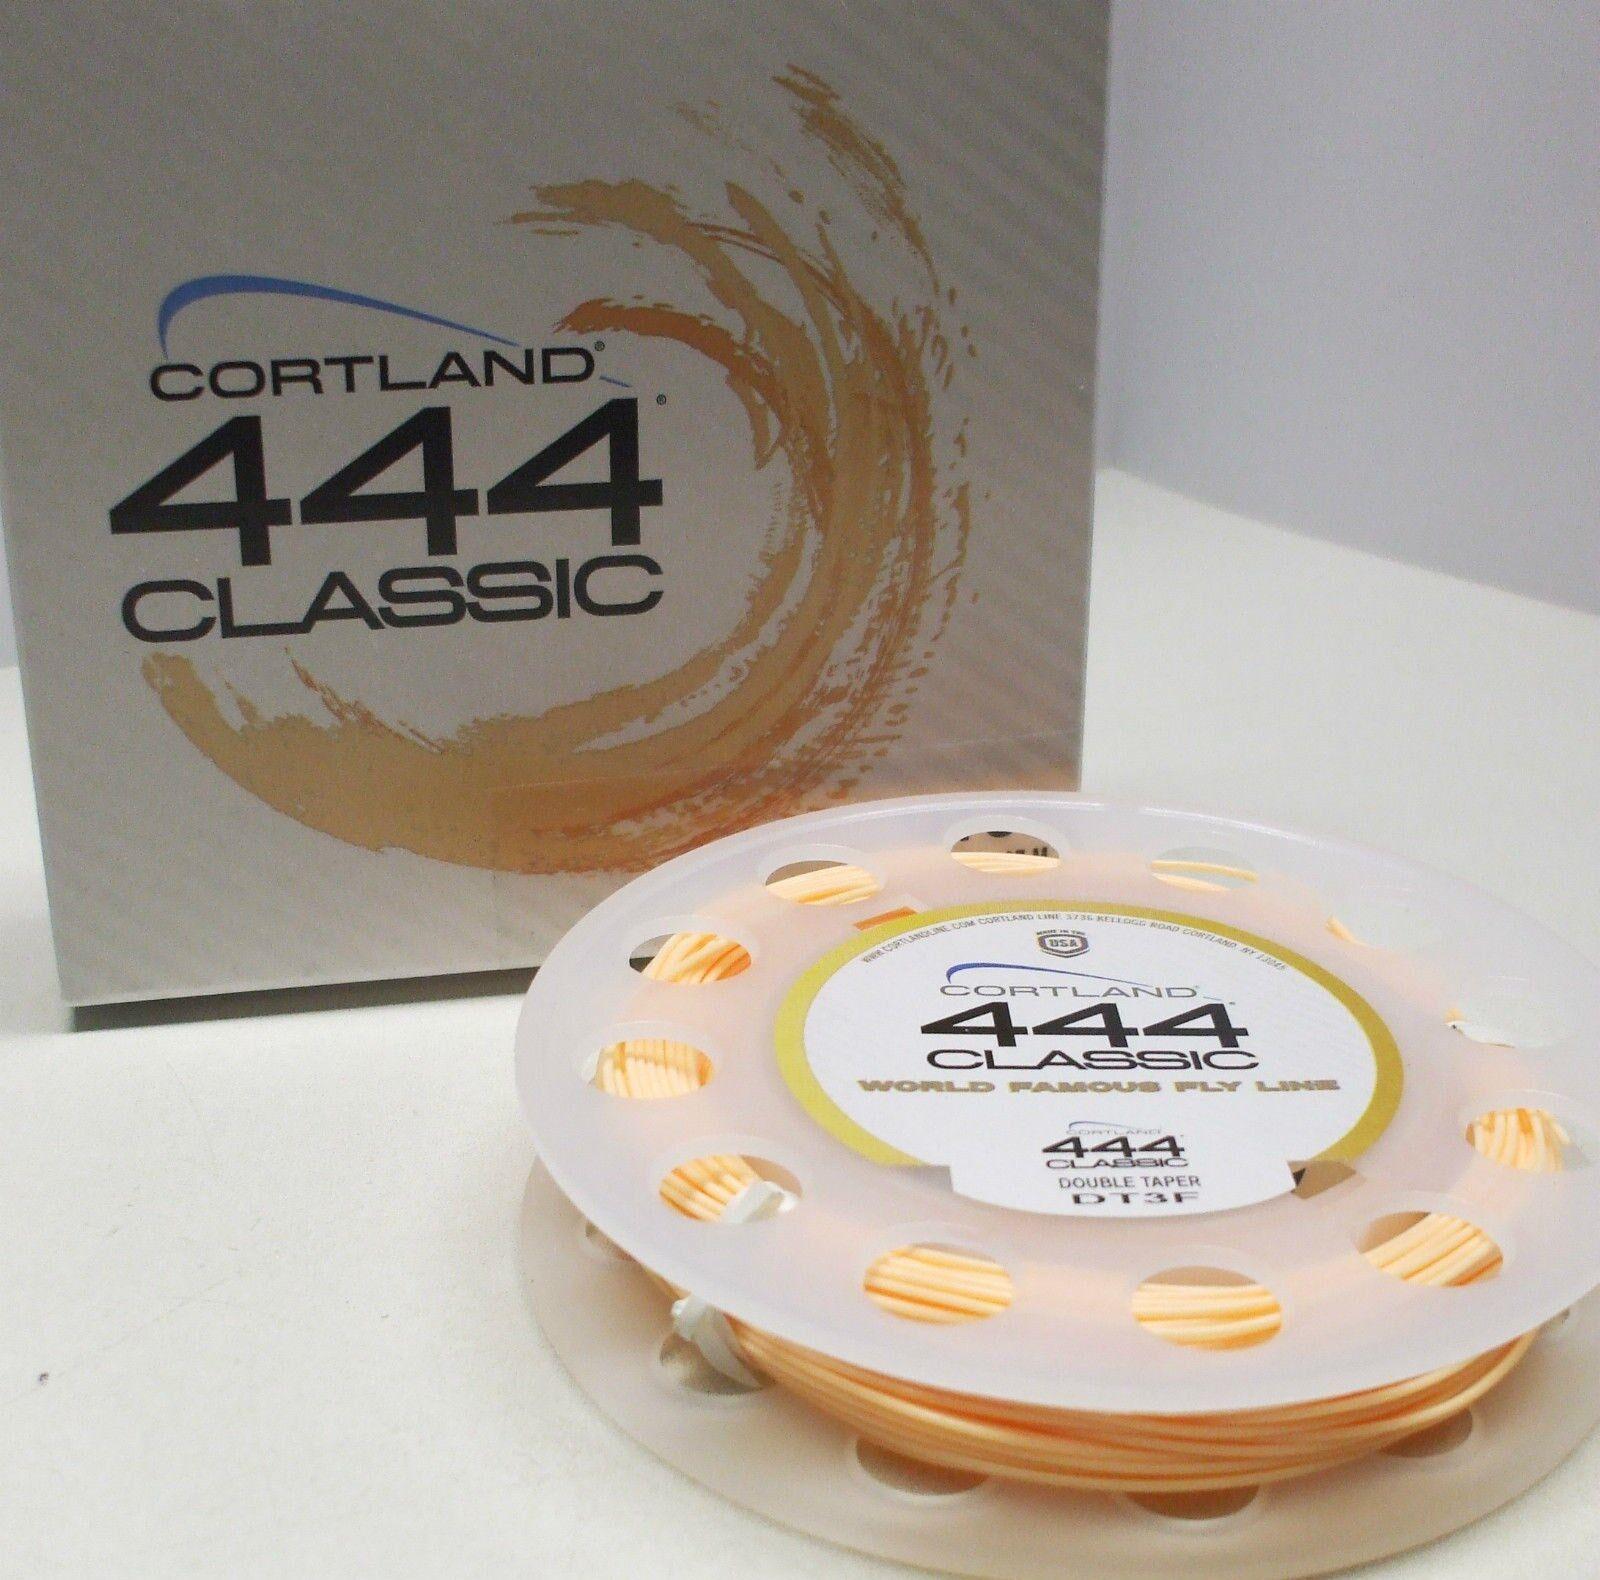 Cortland 444 Classic - Fly Line - Classic Peach WF7F - Brand New 87f6cb